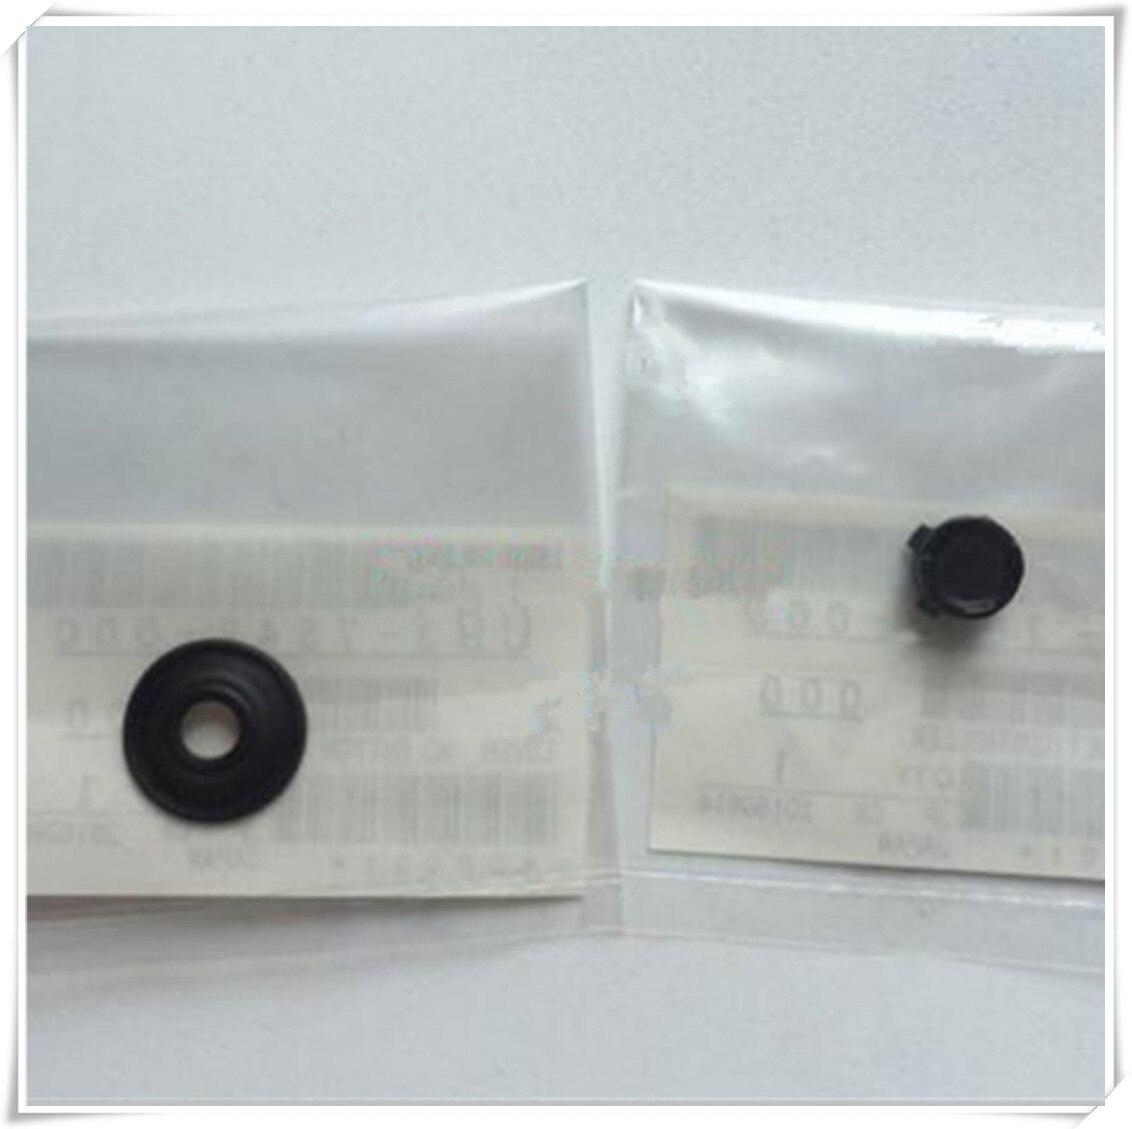 NEW Original Multi-Controller Button Joystick Buttons For Canon EOS 5D3 5D Mark III Camera Replacement Unit Repair Parts